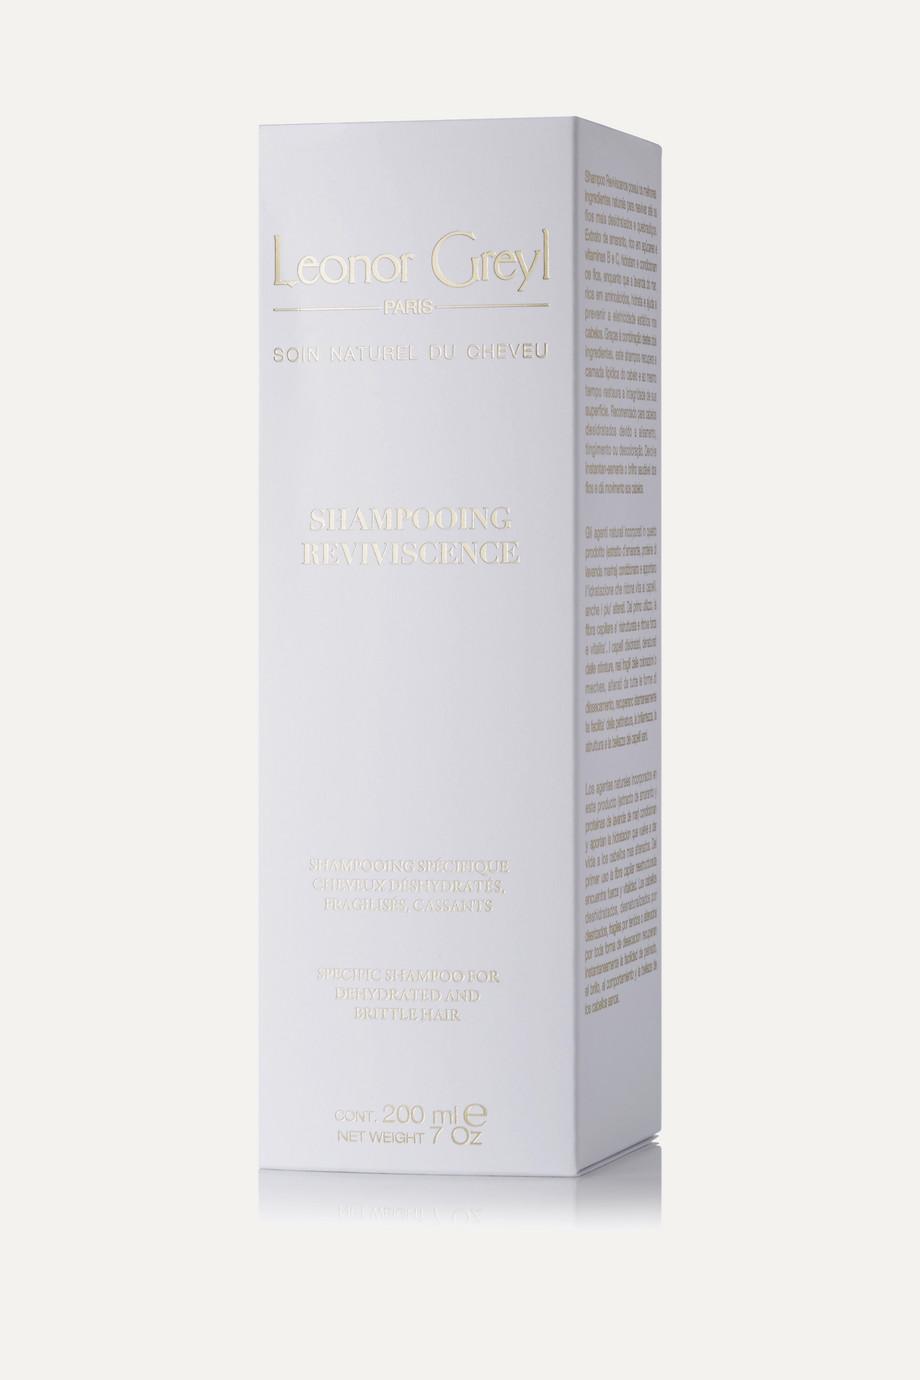 Leonor Greyl Paris Shampooing Reviviscence, 200ml – Shampoo